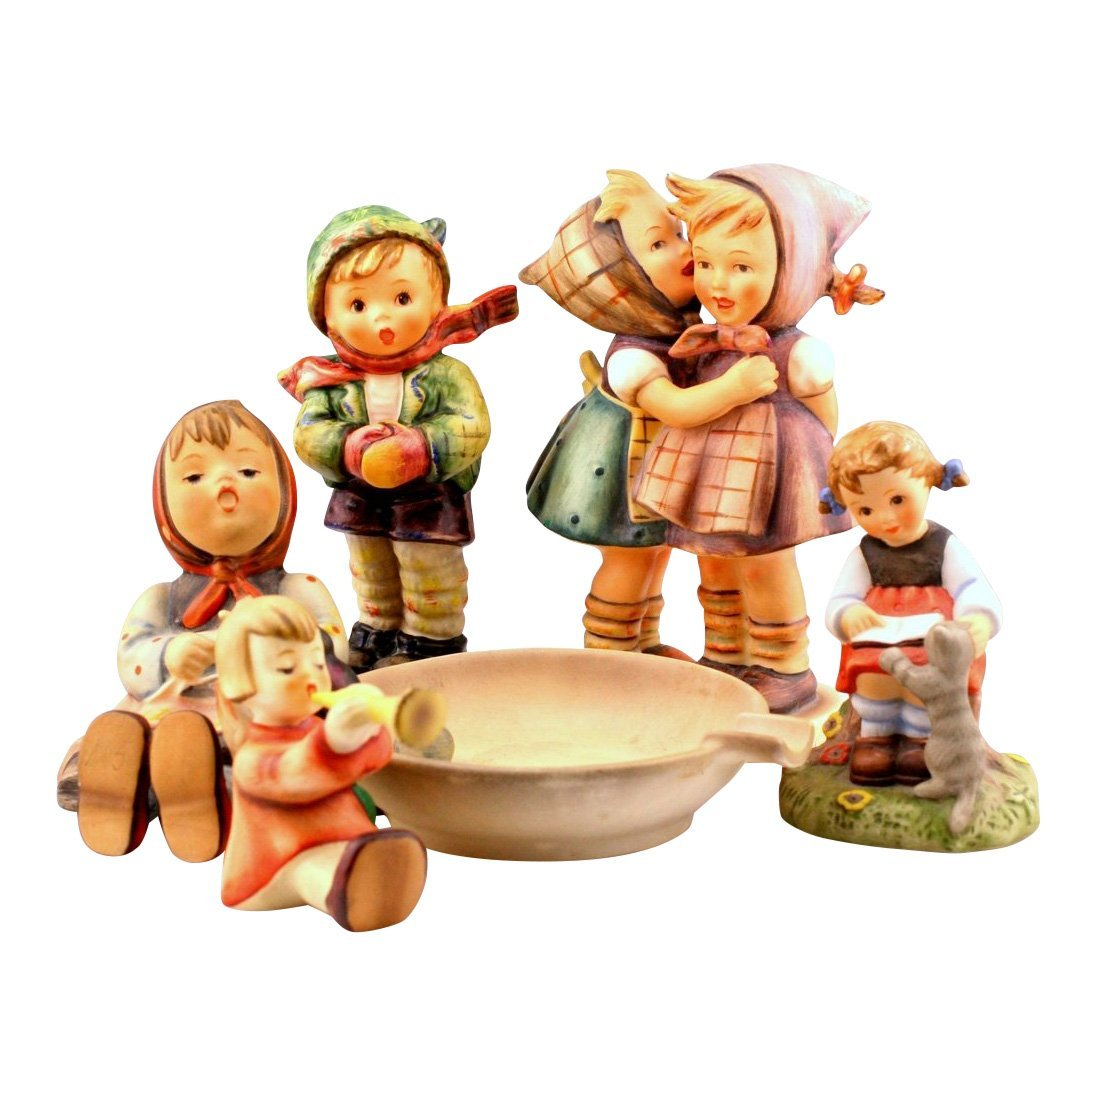 Lot Of 5 Hummel and Goebel Figurines